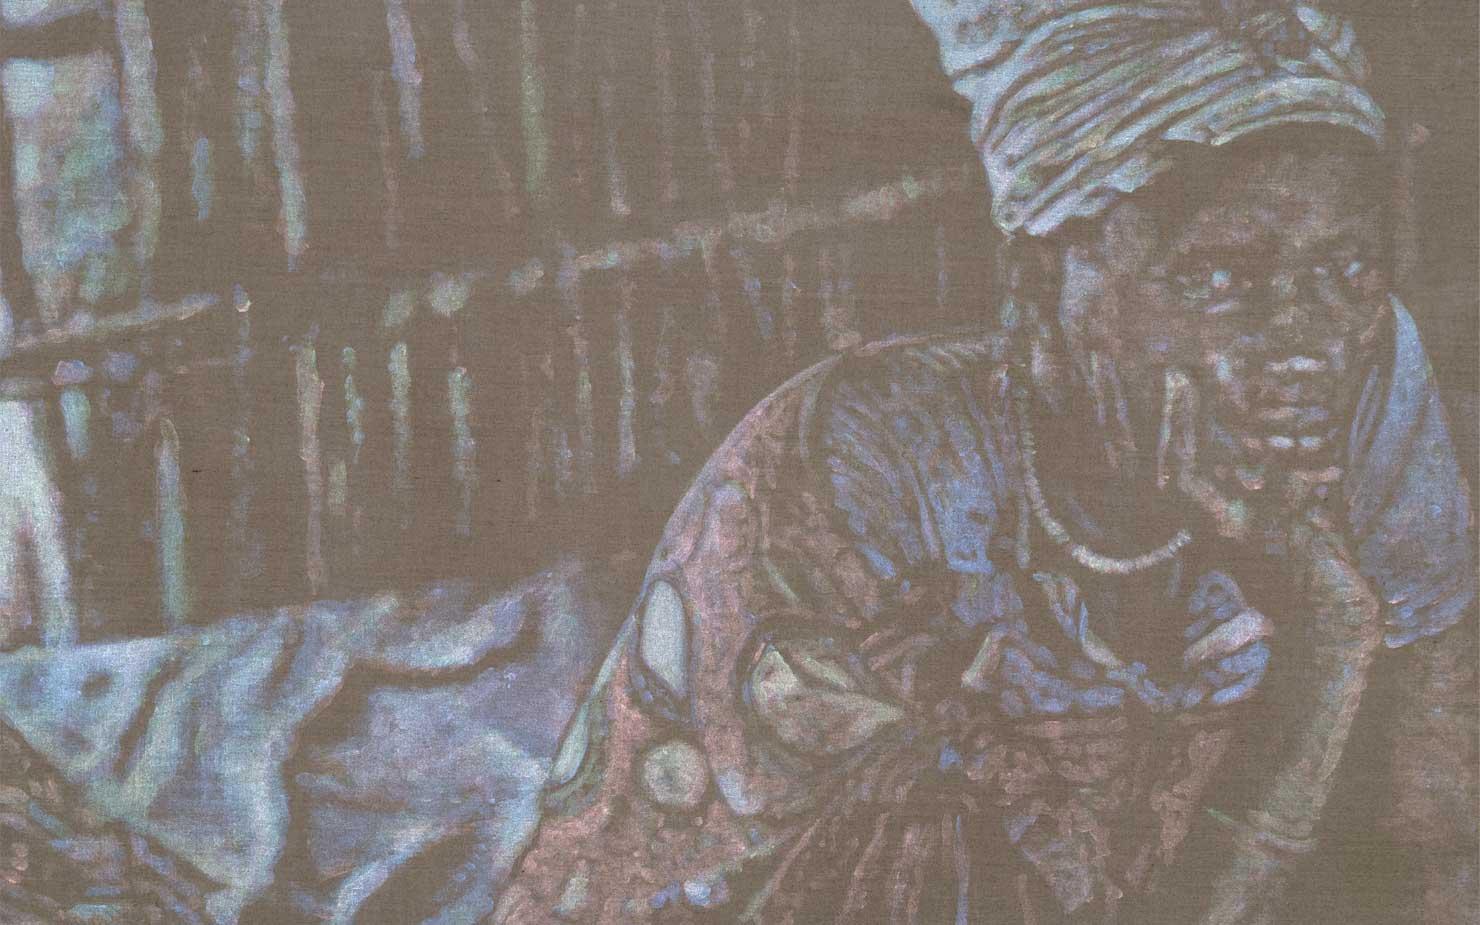 Woman-Sudan-hut-RGBdet